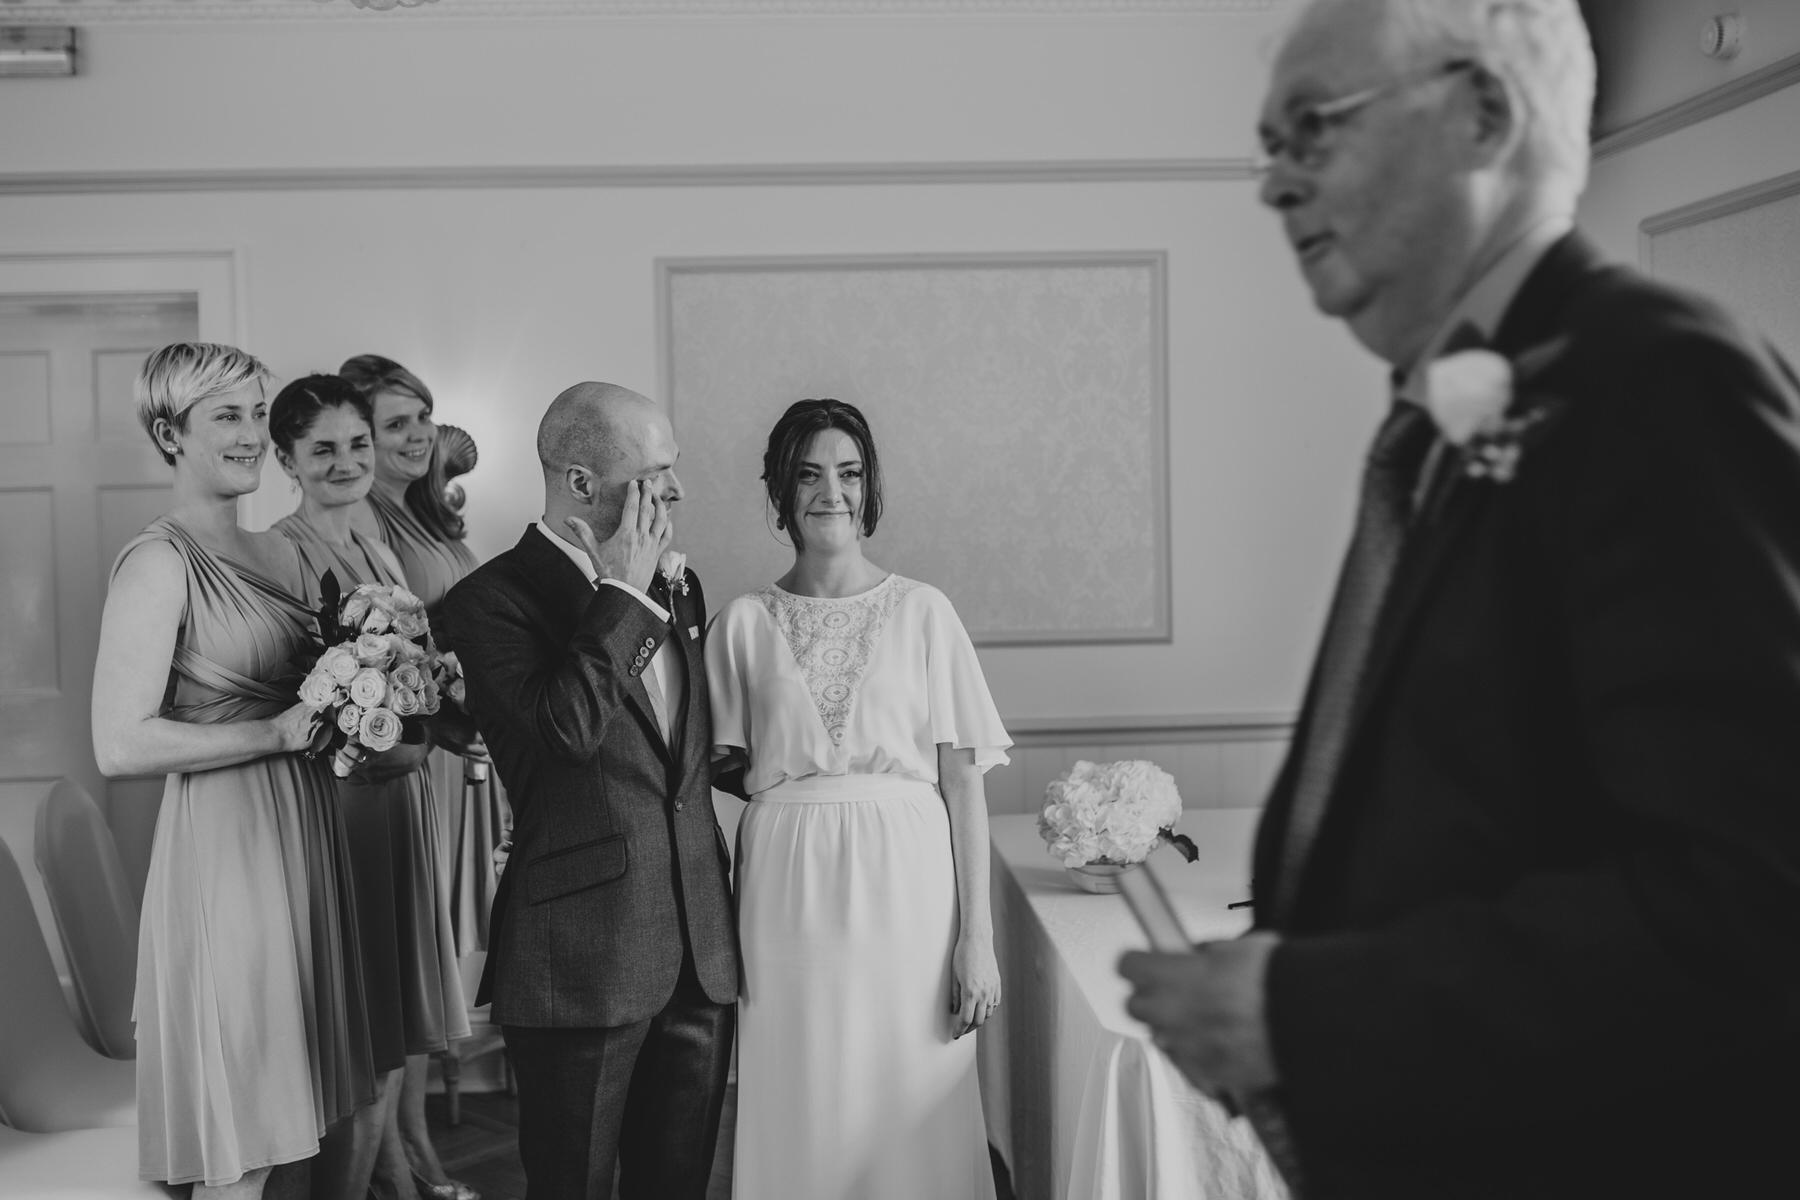 106 BW wedding reportage emotional groom brushing tear away.jpg